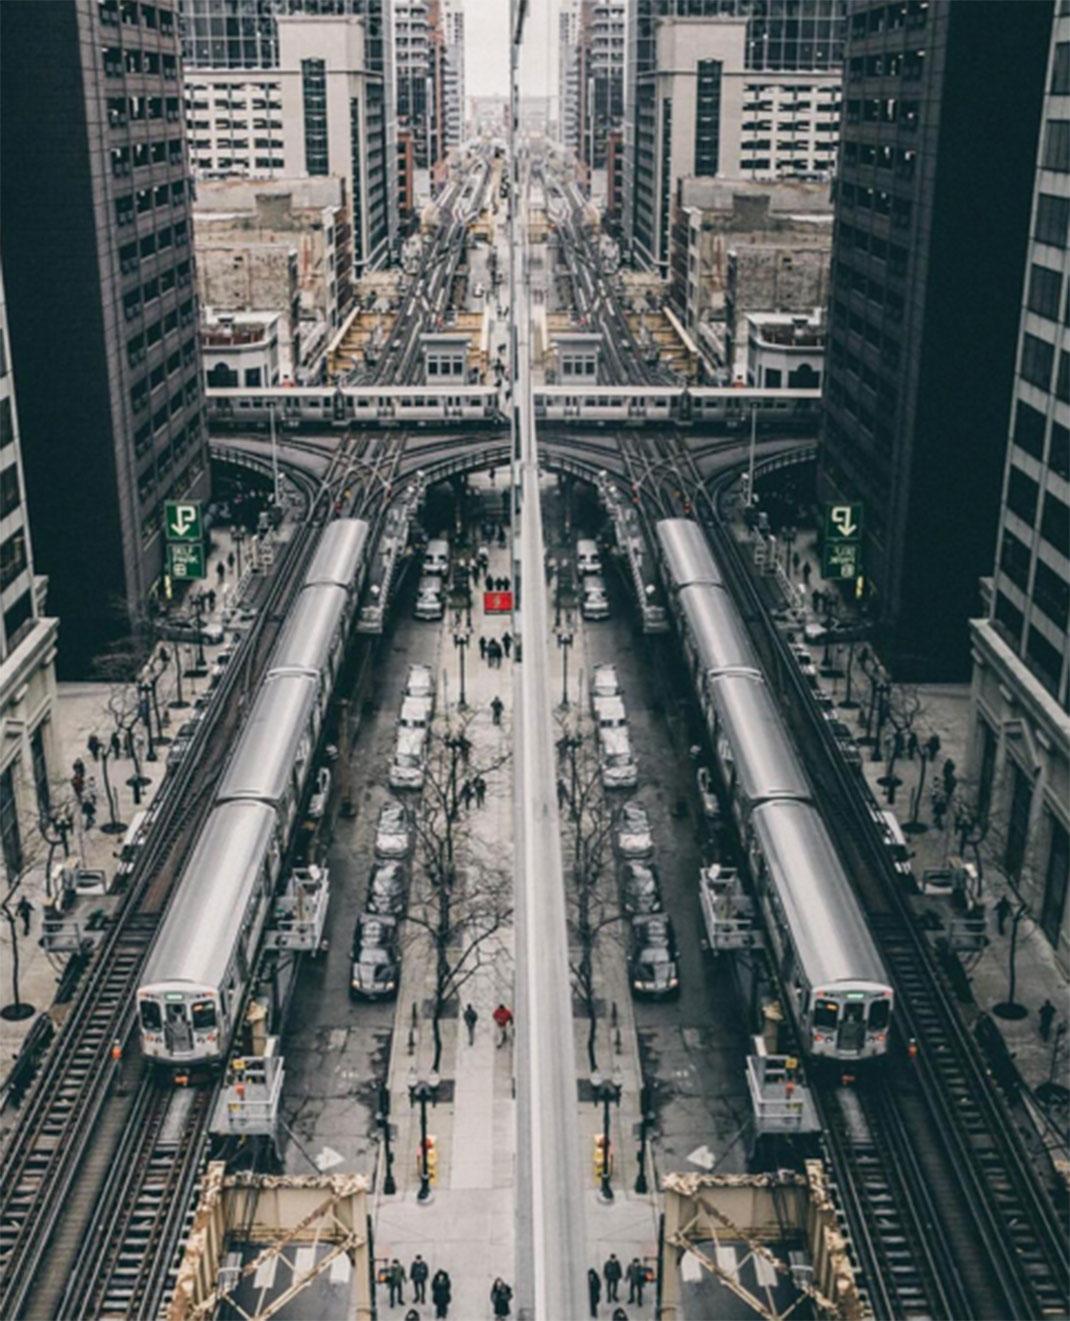 44-architecture-symetrie